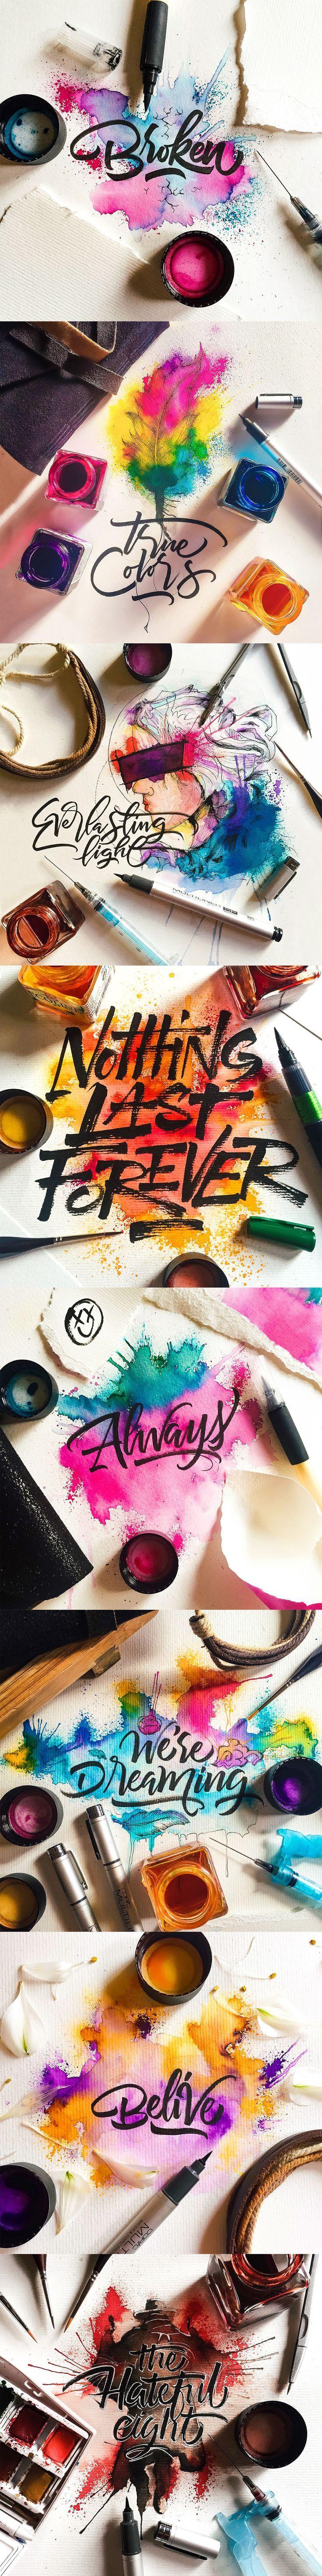 GOORGEOUS LETTERS... Watercolor / Calligraphy on Student Show #letteringdesign #letteringdesignideas